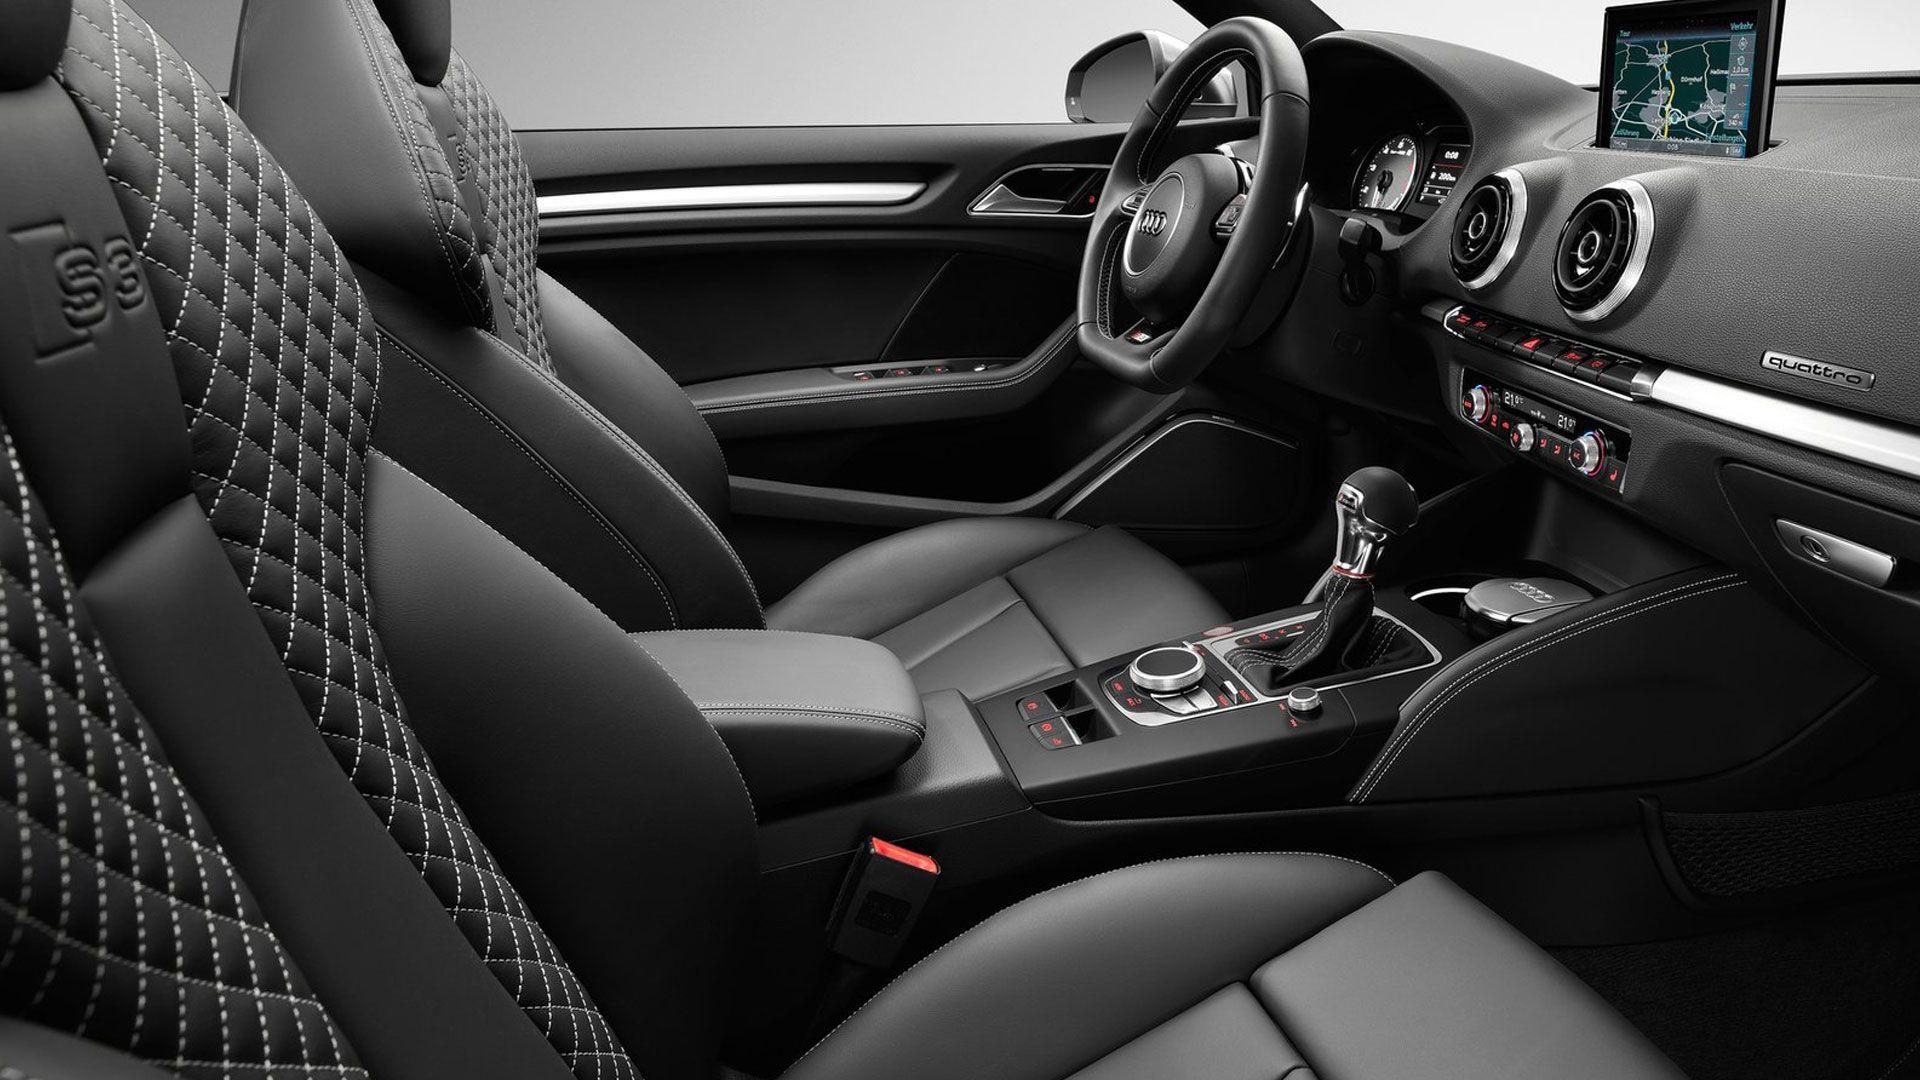 Audi 2015 audi s3 cabriolet